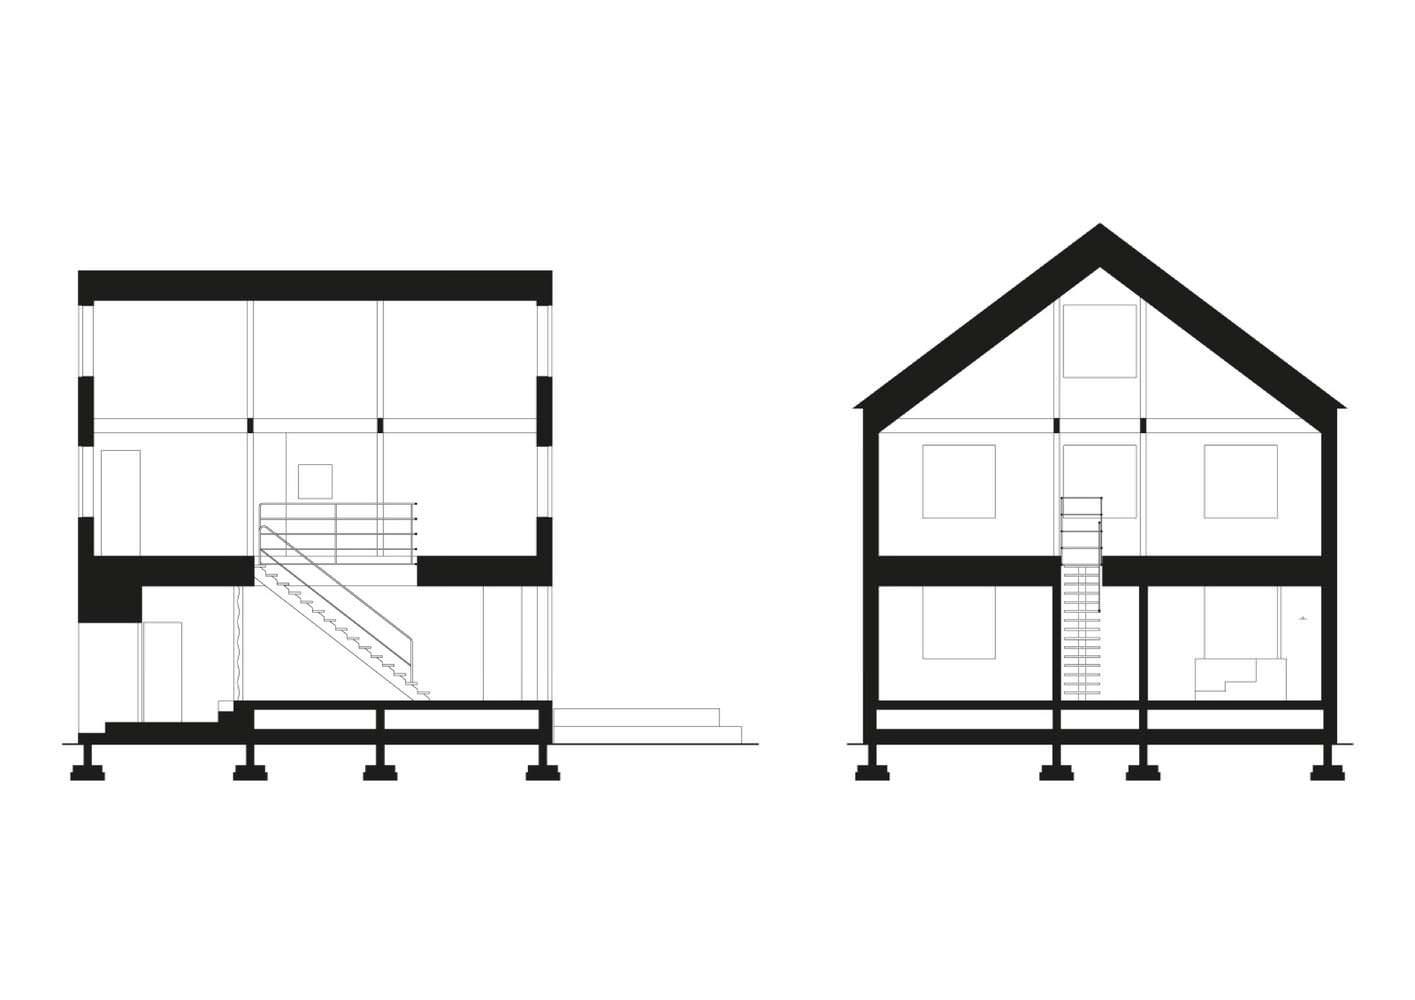 План горного шале по-японски от Florian Busch Architects